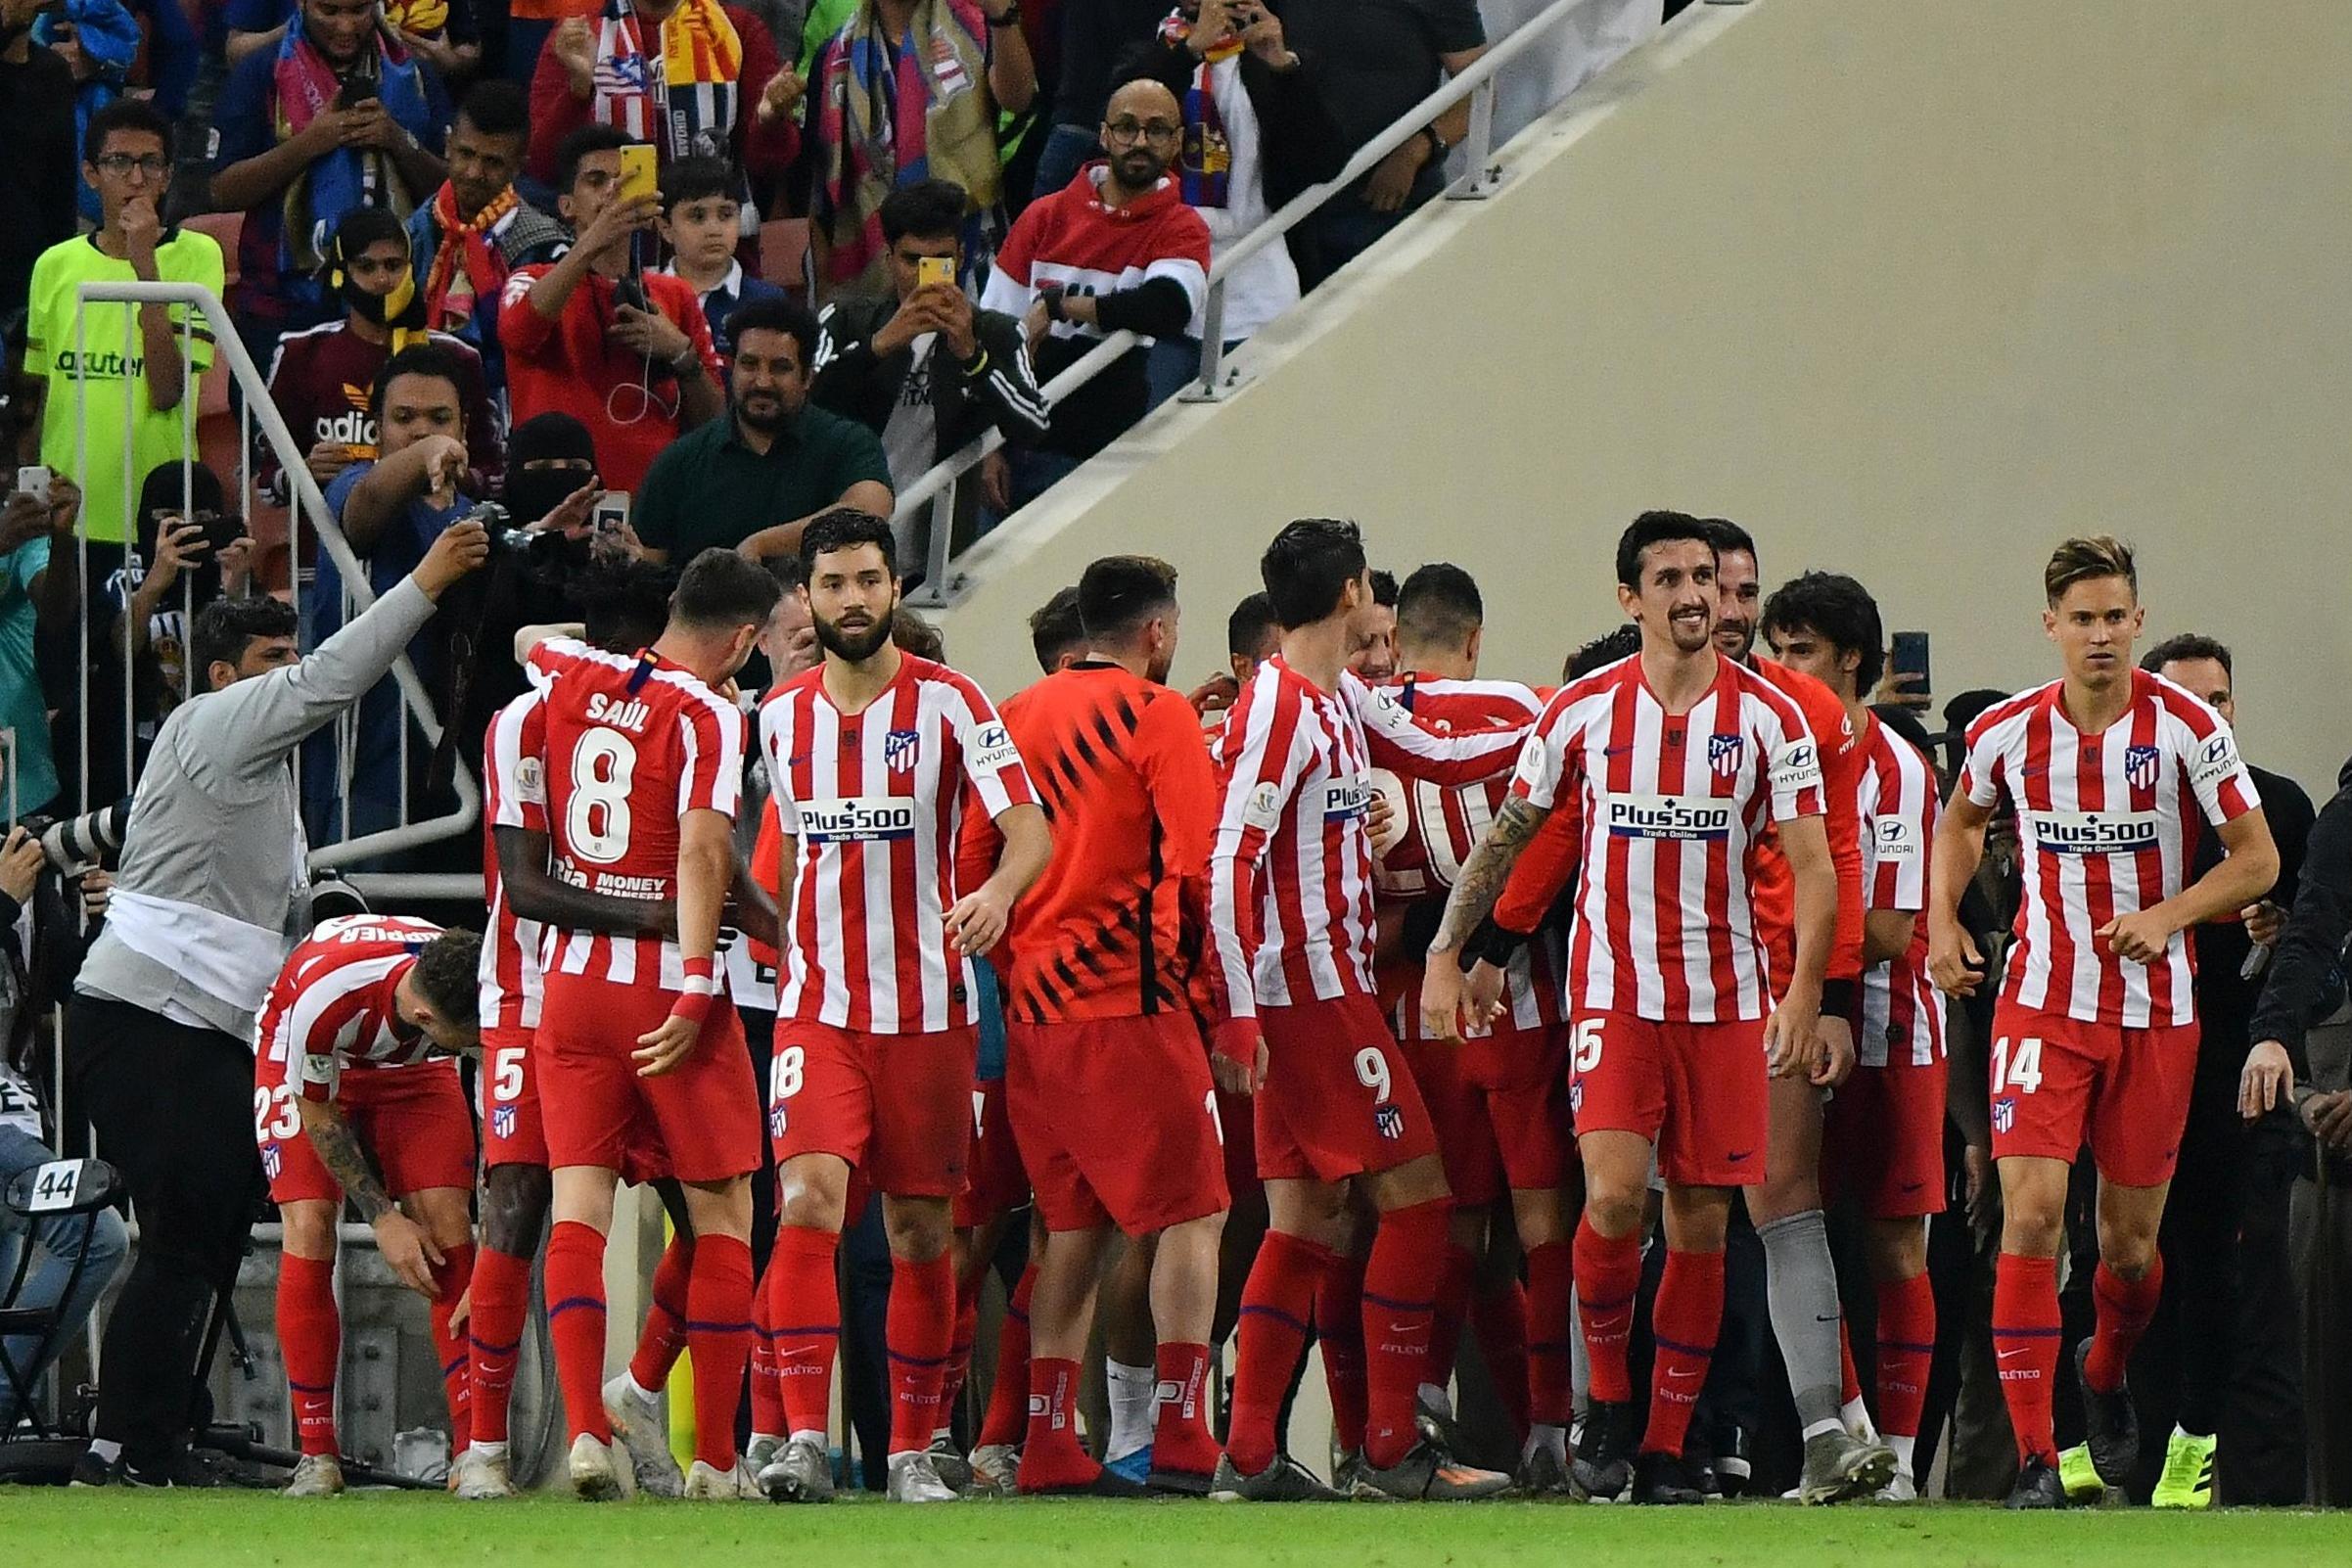 Diego Simeoni praises Atletico Madrid players for comeback a